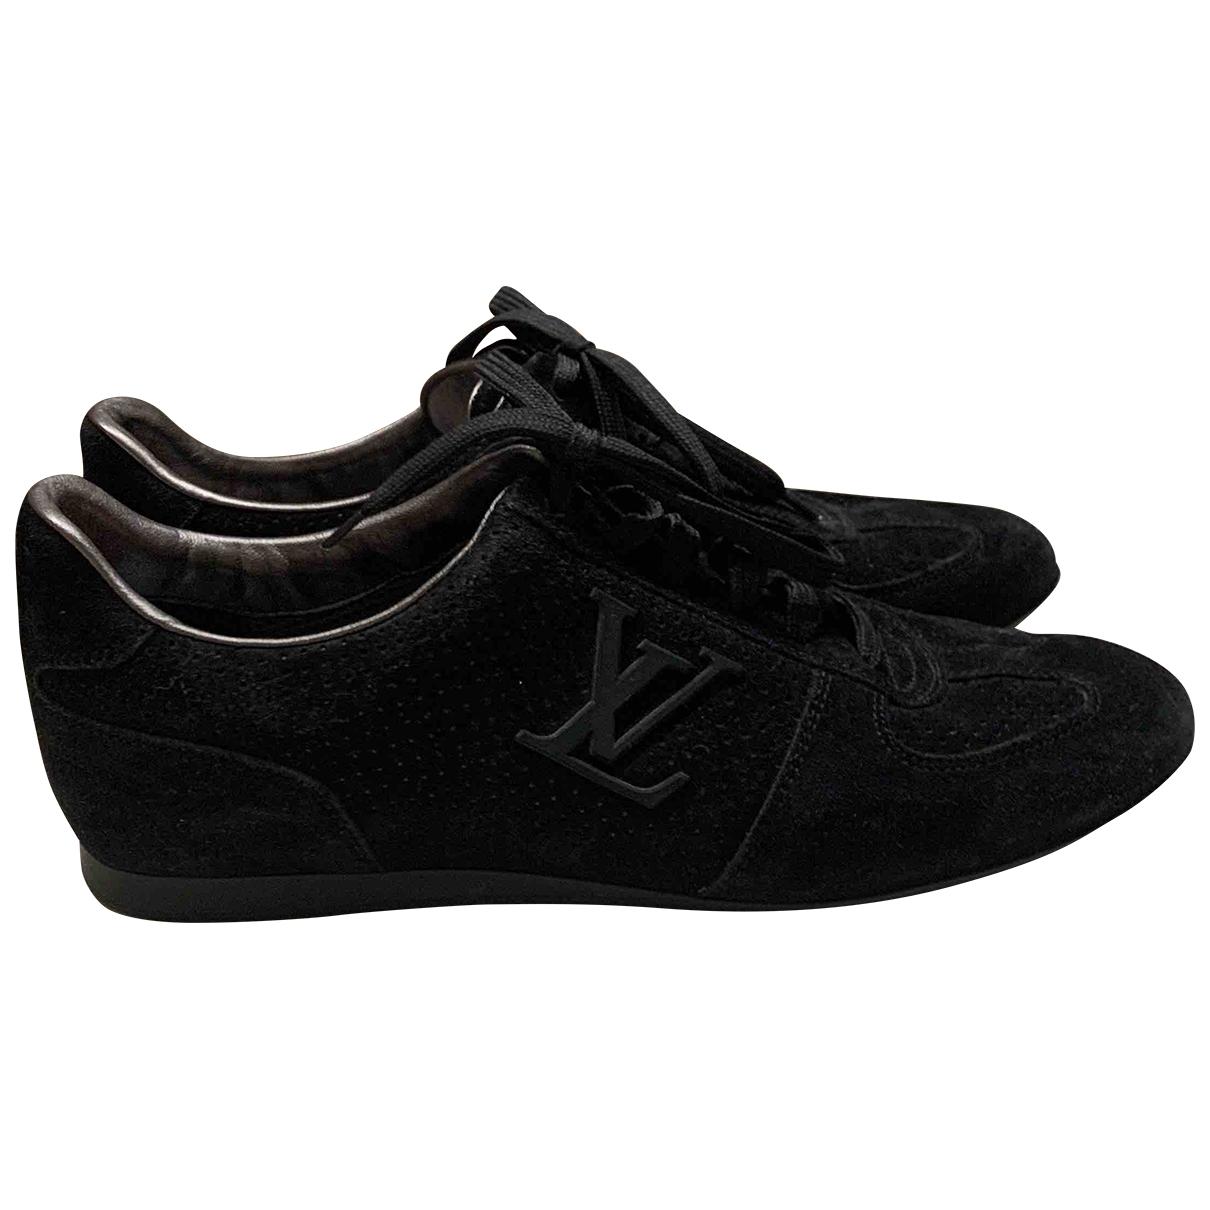 Louis Vuitton \N Black Suede Trainers for Women 37 EU